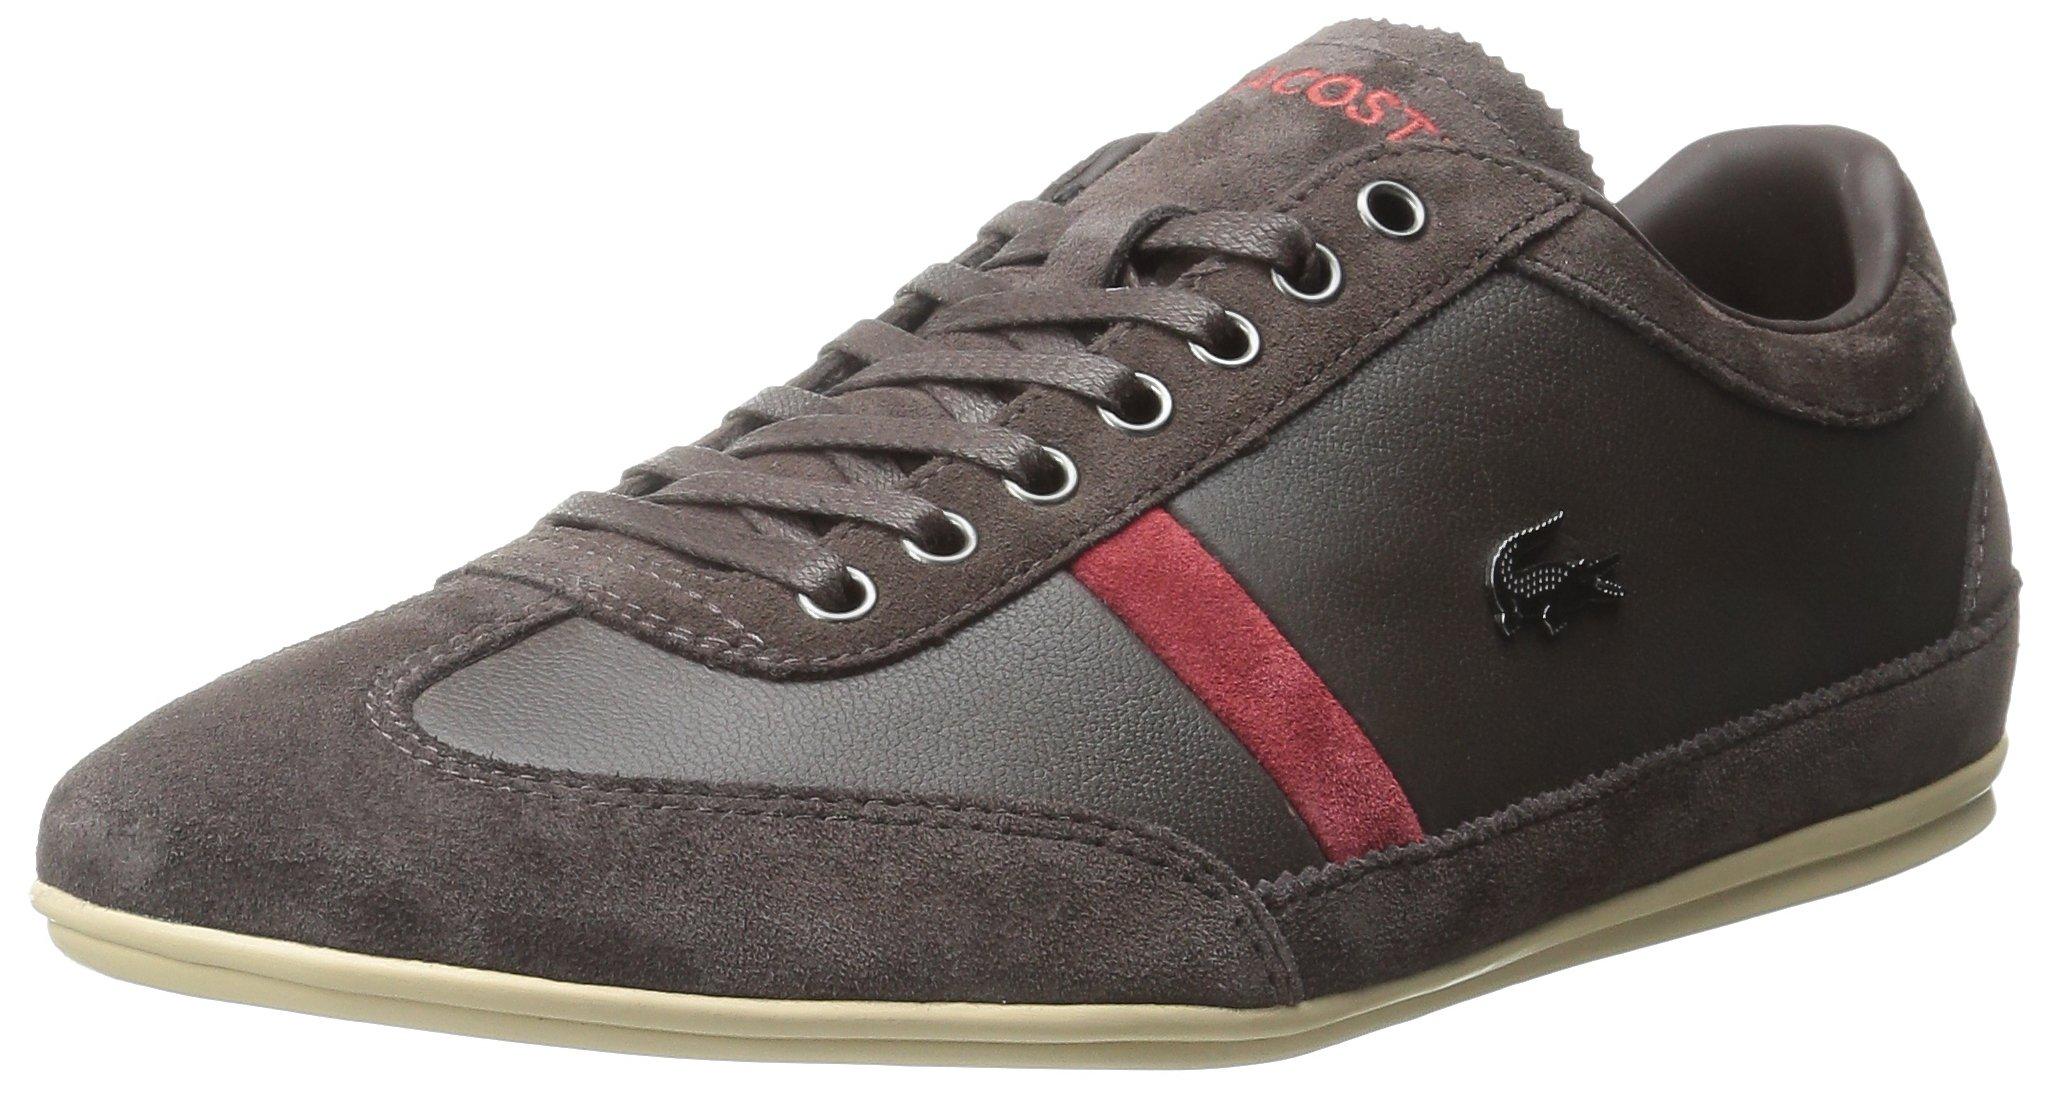 Lacoste Men's Misano 22 LCR Fashion Sneaker, Dark Brown, 8 M US